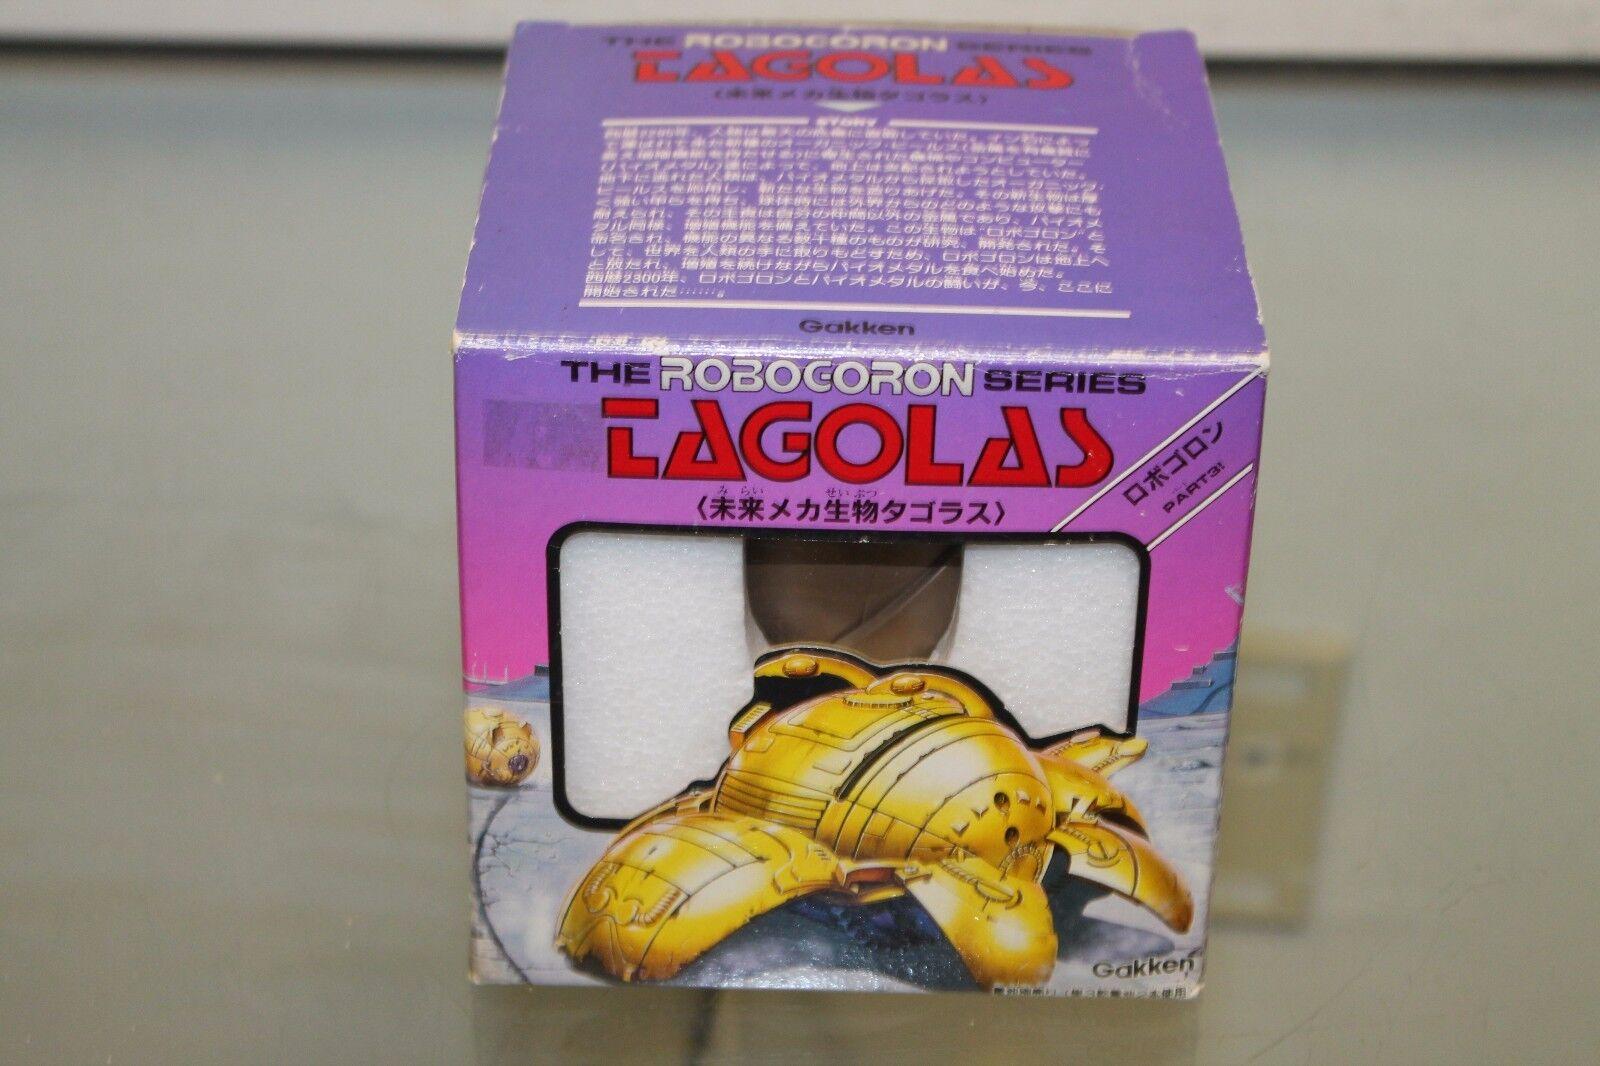 Vtg RARE The Roboggoldn Series Tagolas Gakken Toy Original Box 1980's